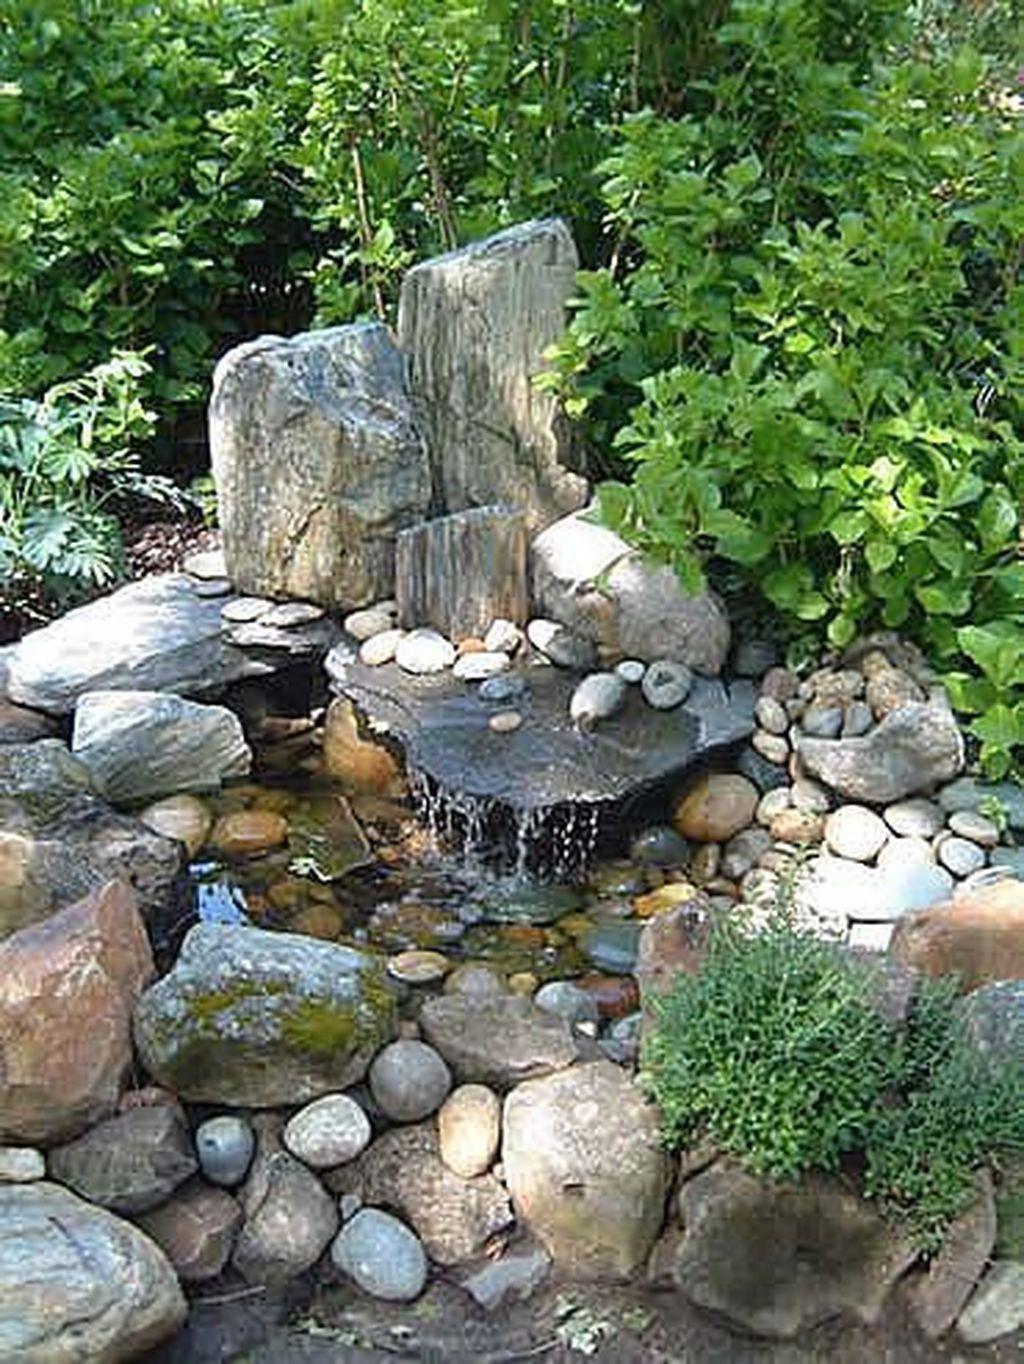 Awesome 99 Creative Rock Garden Ideas For Your Backyard Waterfalls Backyard Water Features In The Garden Rock Garden Design